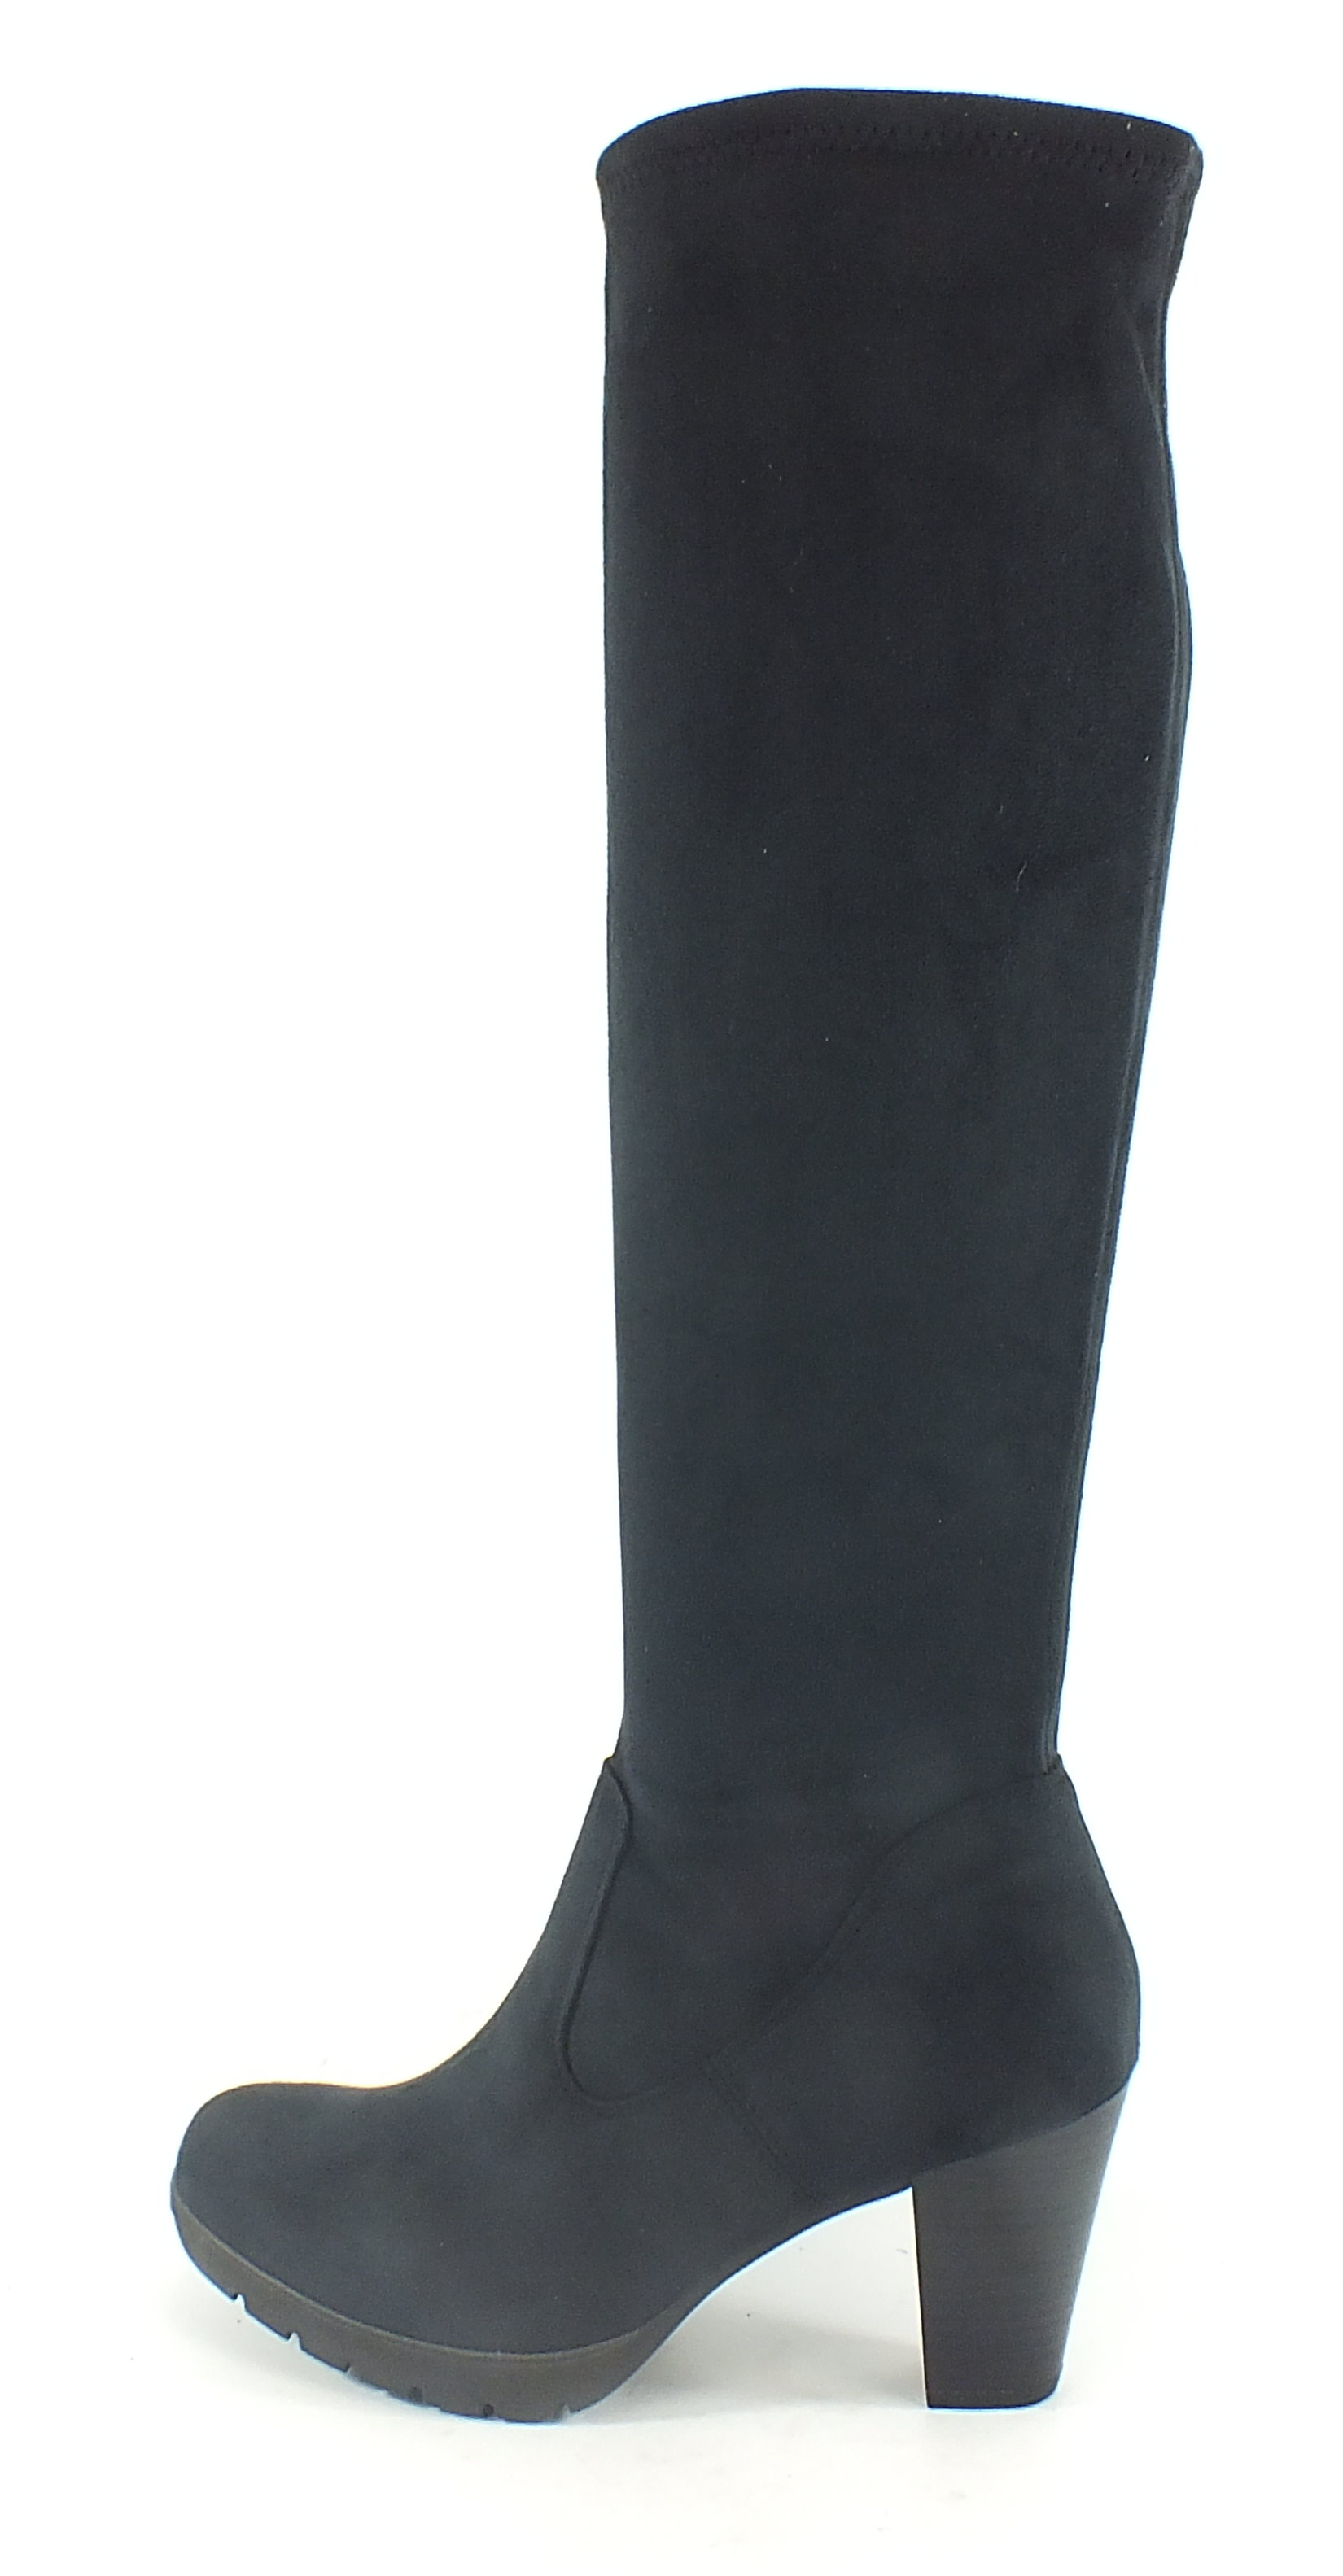 tamaris stretch stiefel boots navy blau 7443 ebay. Black Bedroom Furniture Sets. Home Design Ideas